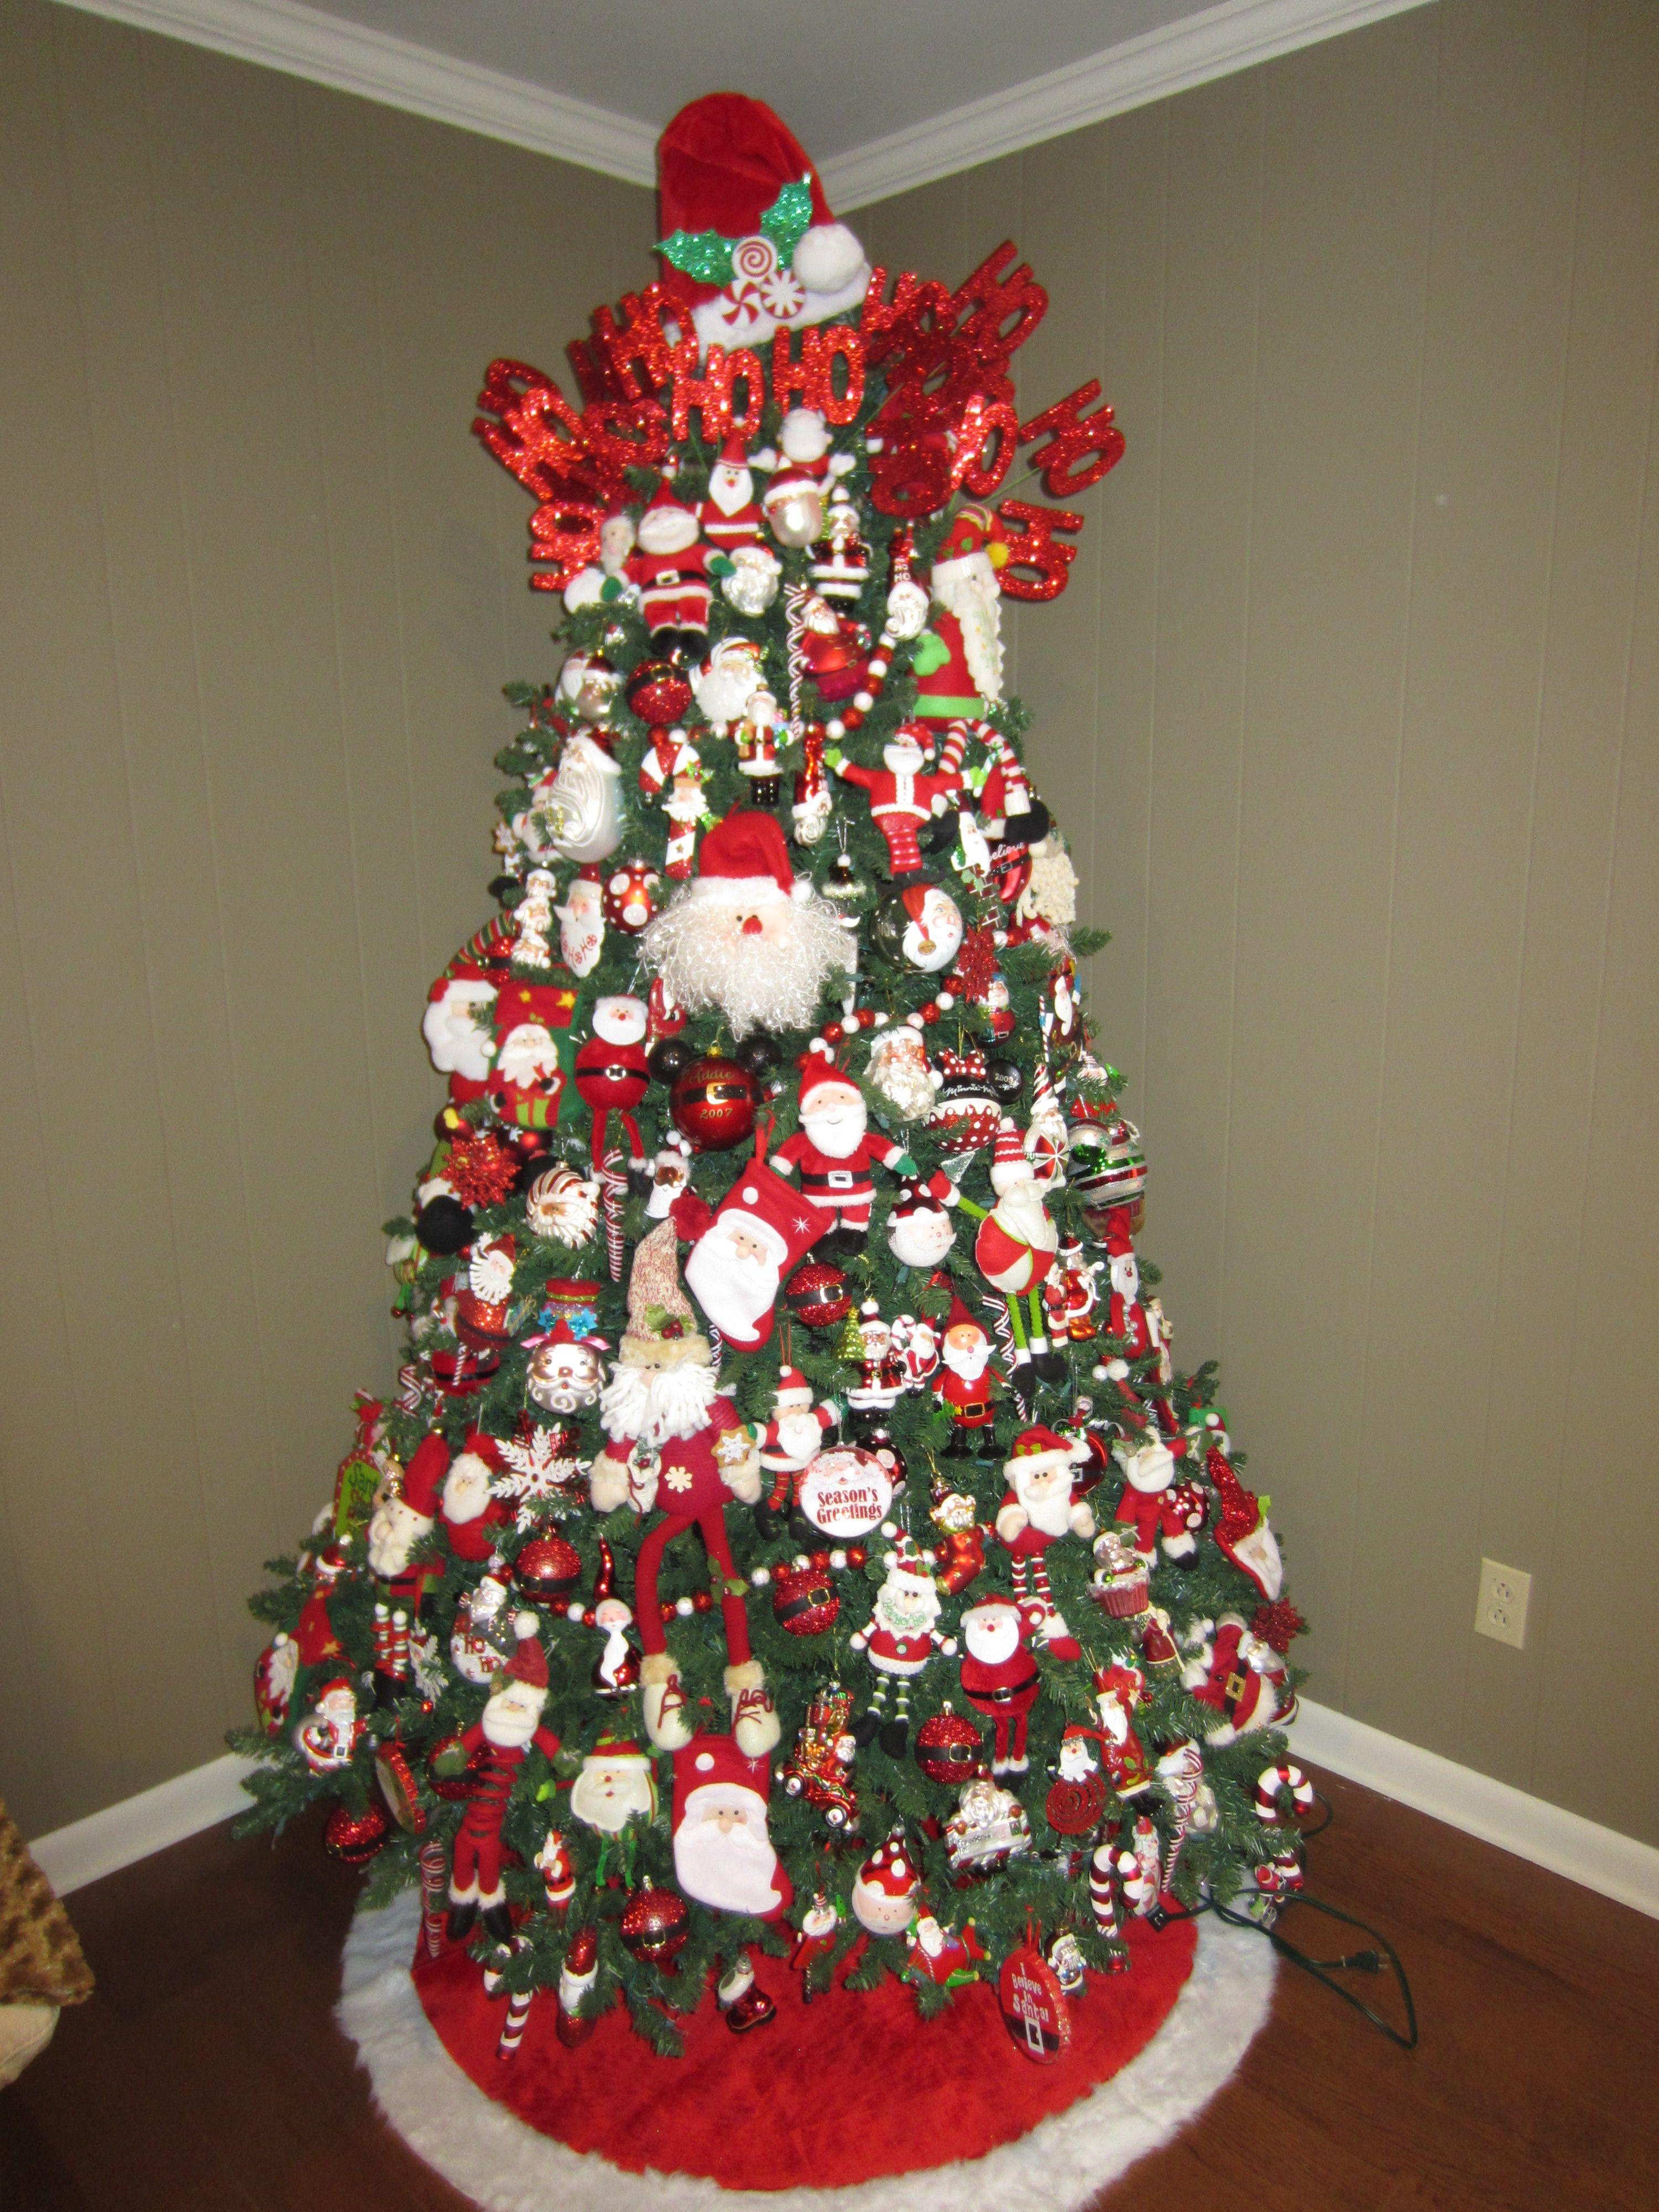 Santa Christmas Tree Santa Claus Christmas Tree Small Christmas